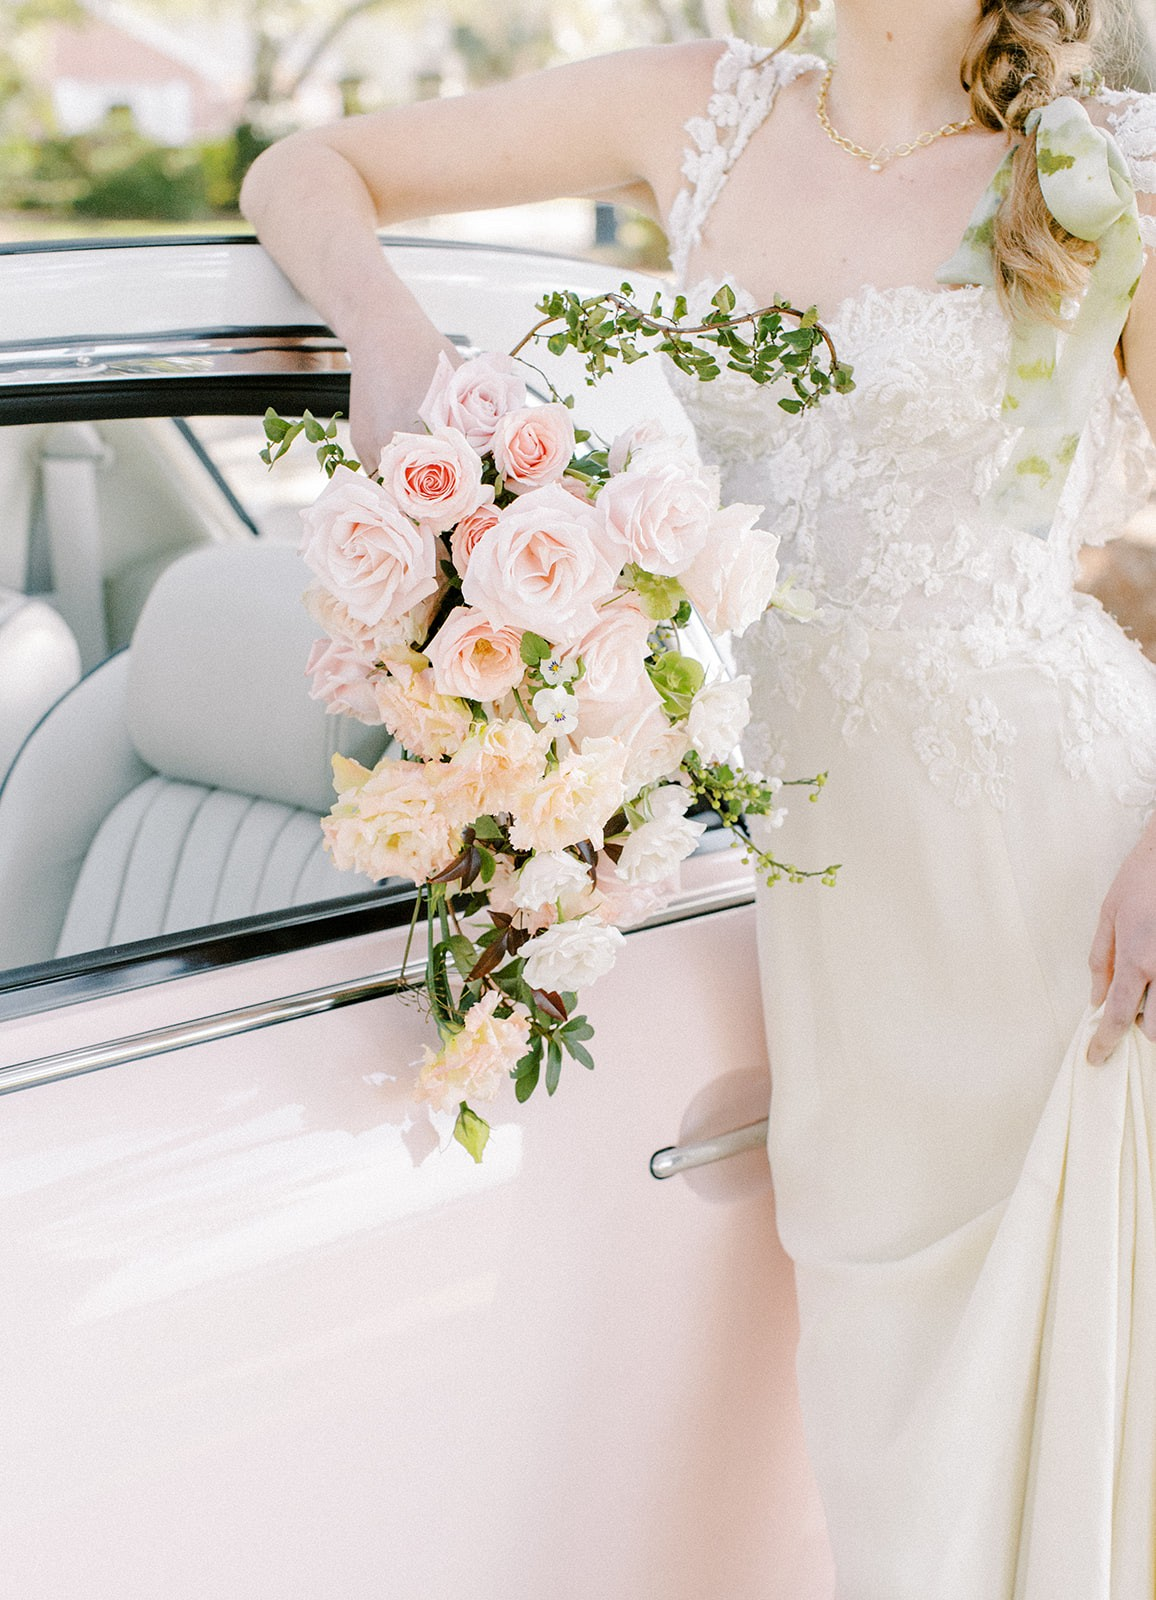 TRADITIONAL WEDDING DRESSES 2022